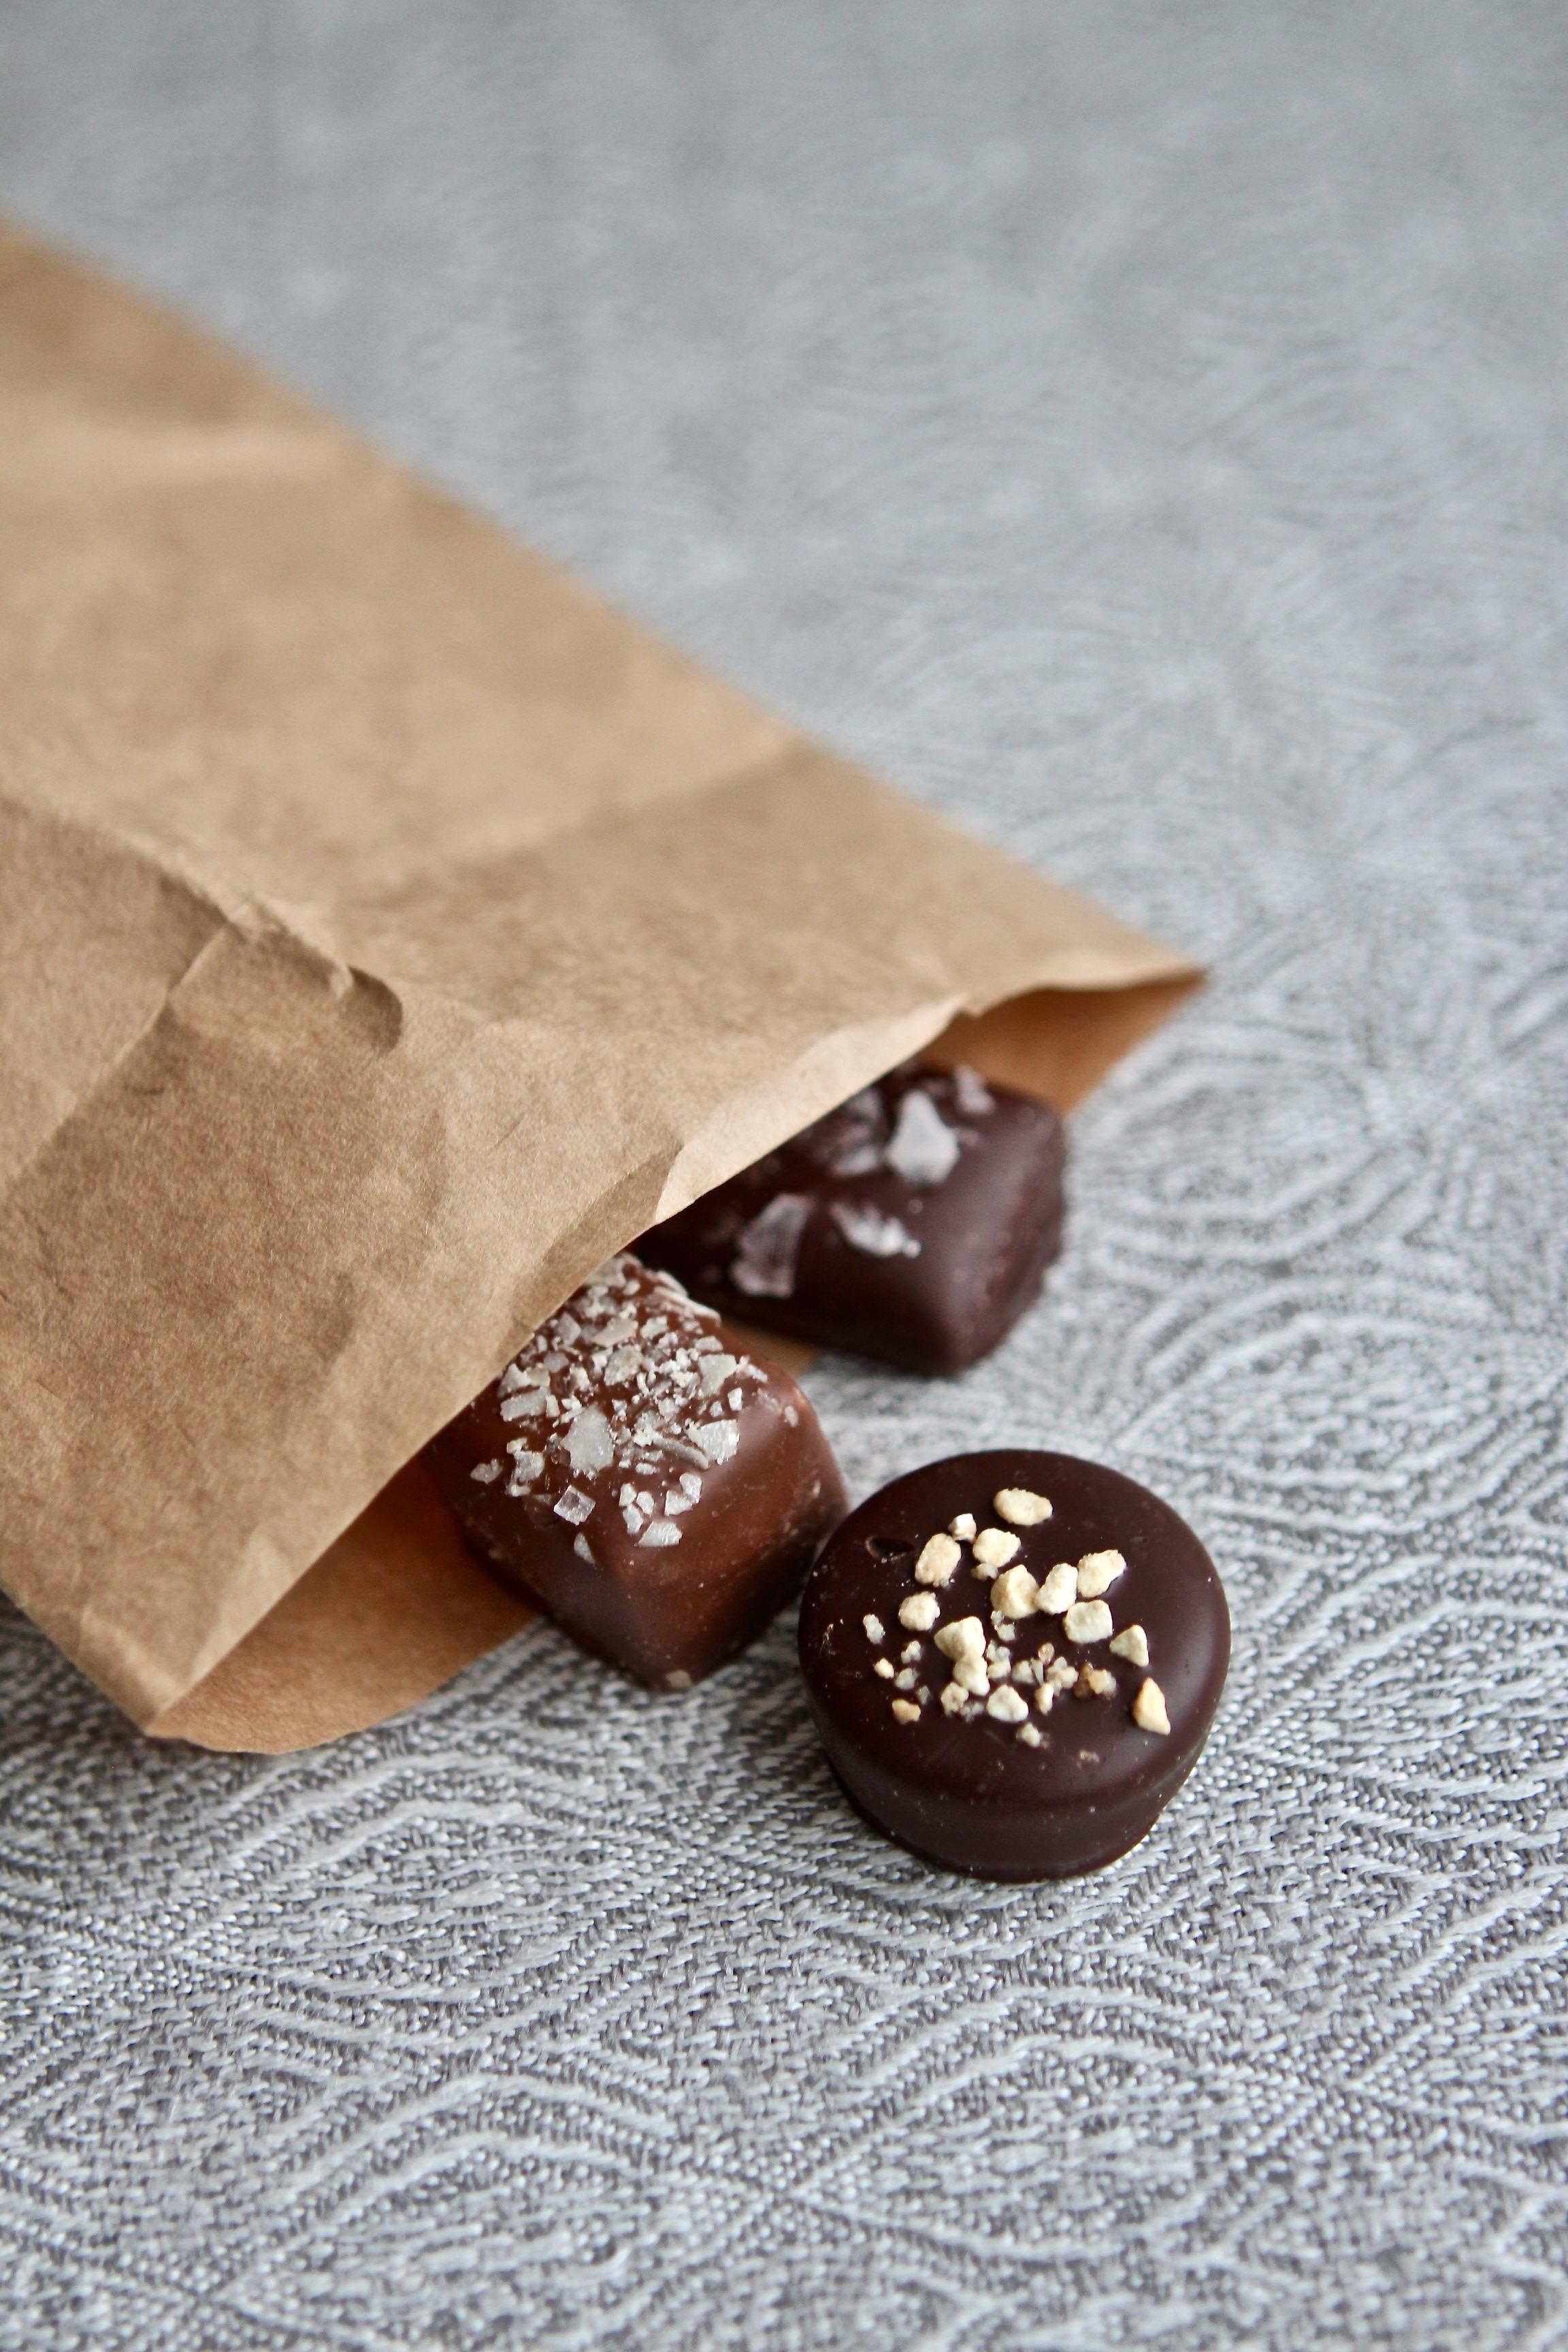 Fin liten choklad fläck!